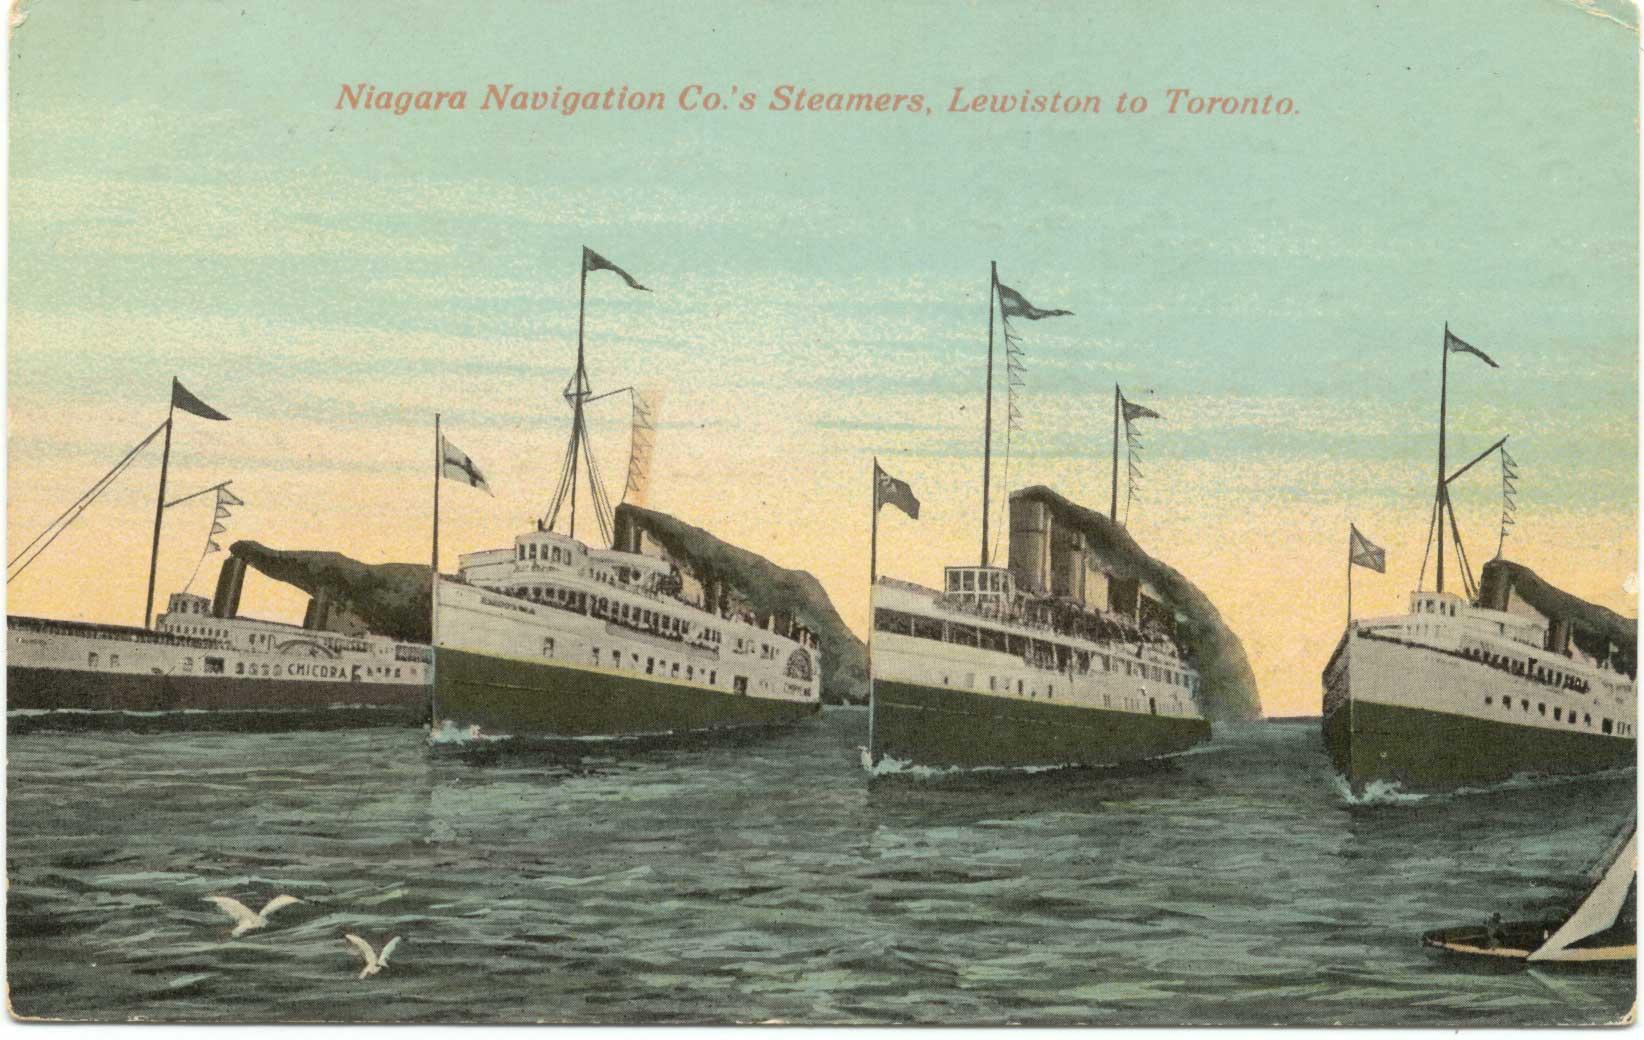 Niagara Navigation Co.'s Steamers, Lewiston to Toronto